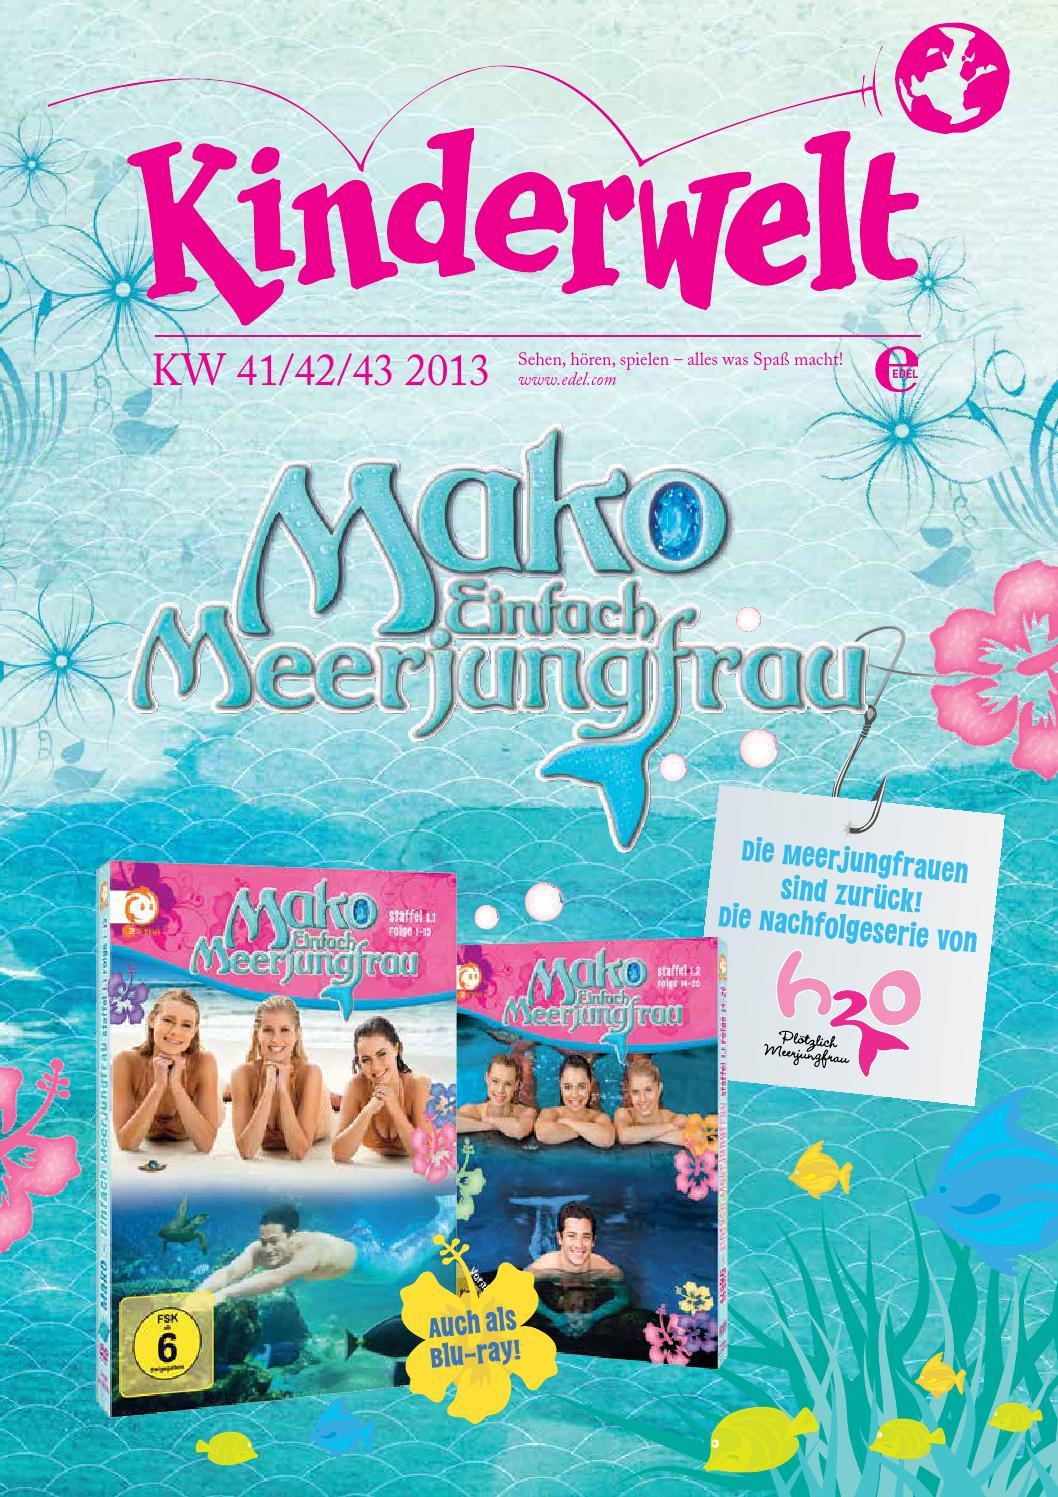 Kinderwelt 41 43 Final By Edel Germany Gmbh - Issuu bestimmt für H2O Plötzlich Meerjungfrau Episodenguide